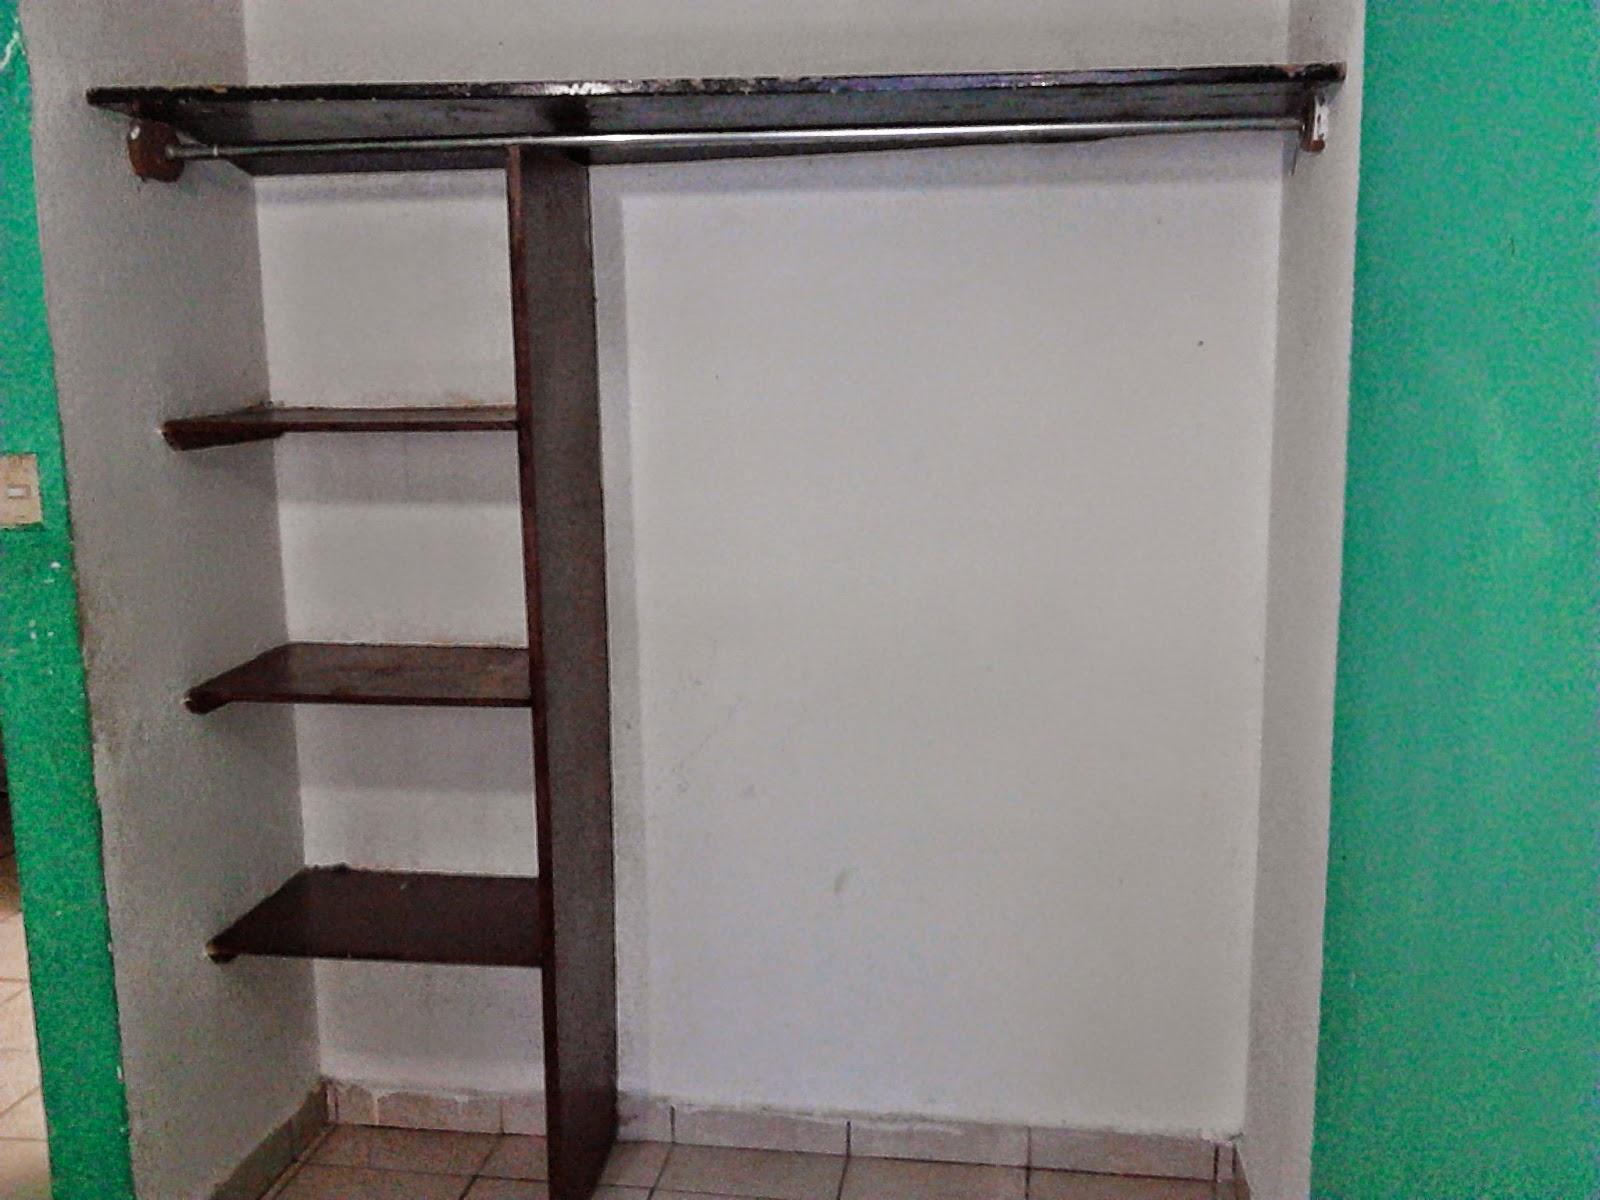 Como hacer un closet sencillo pictures to pin on pinterest - Hacer un porche economico ...